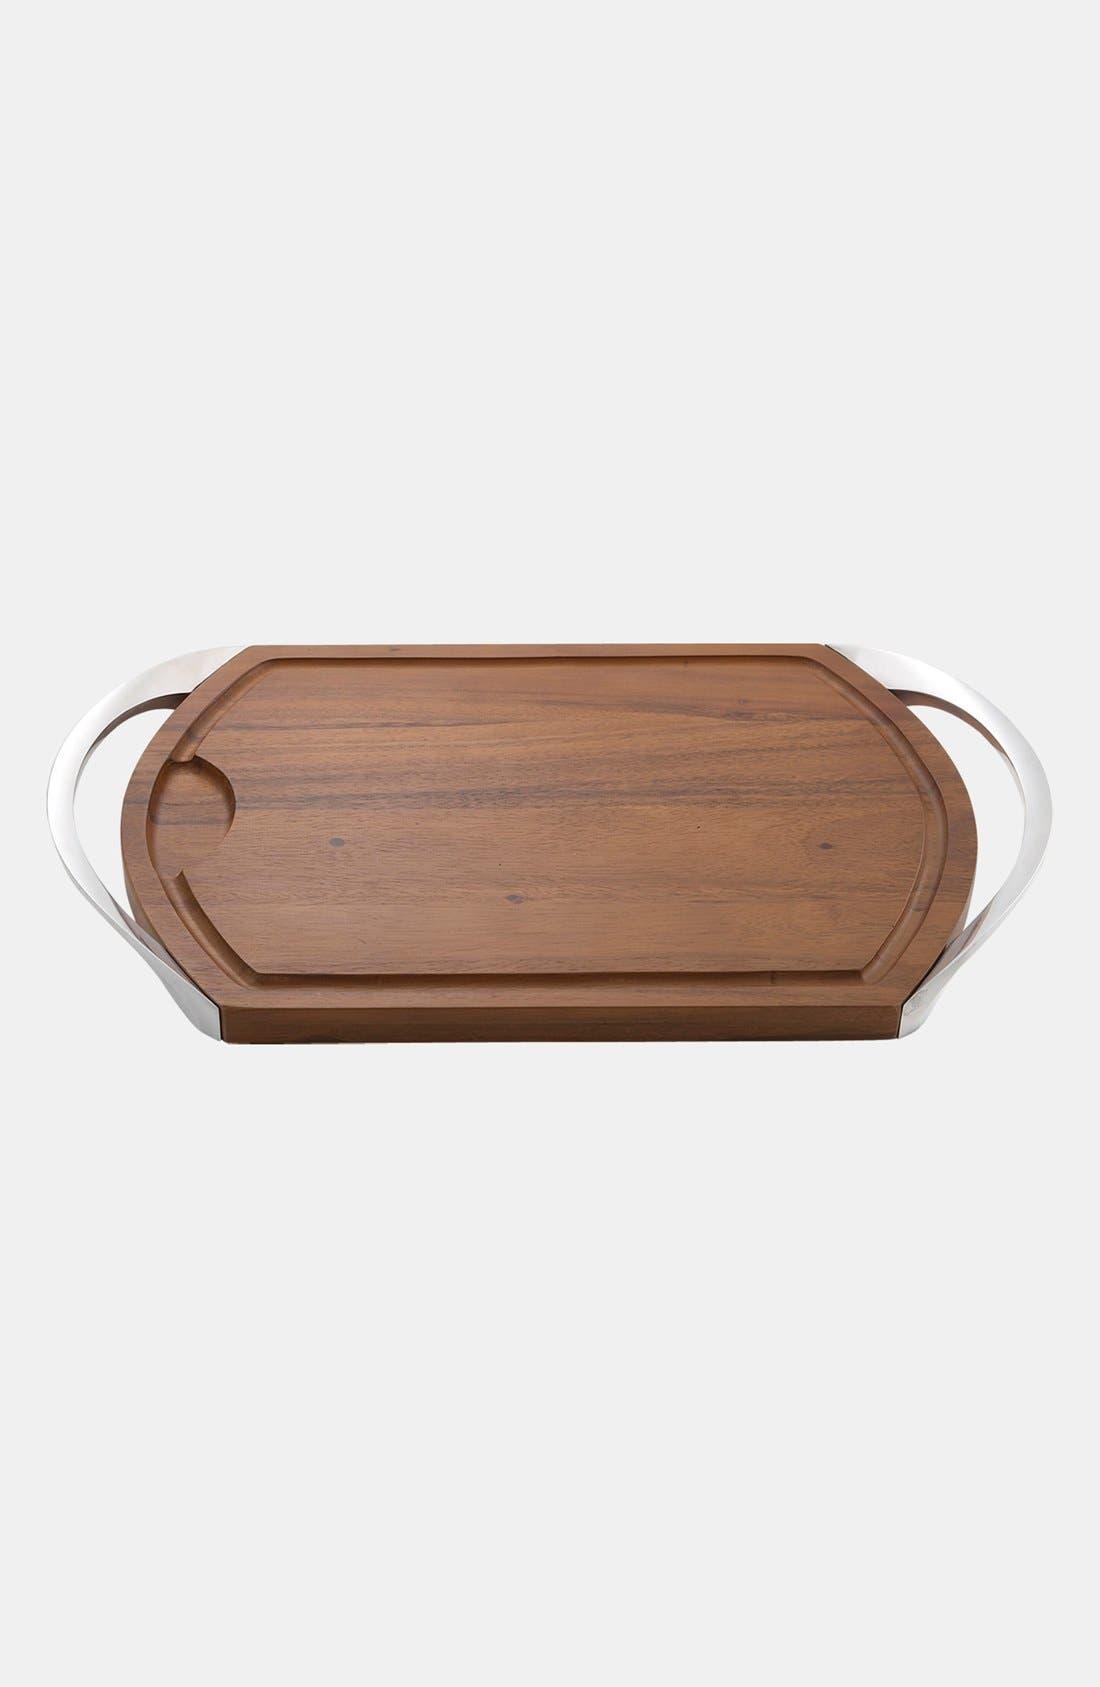 Main Image - Nambé Carve & Serve Cutting Board